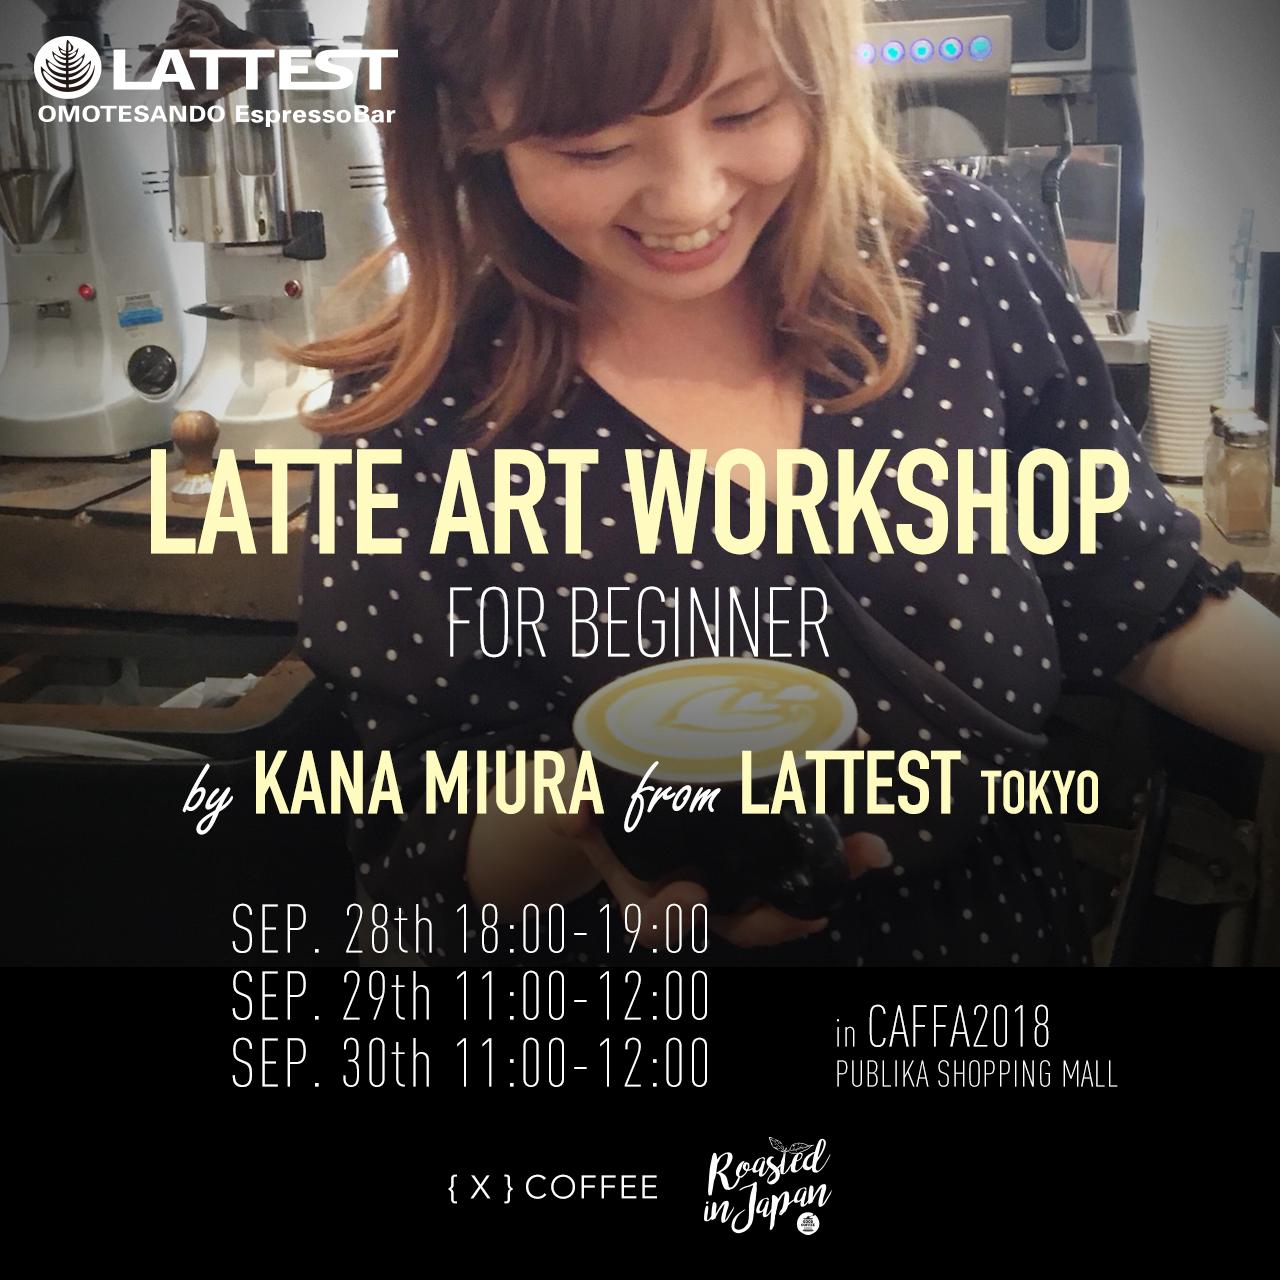 Latte Art Workshop by Kana, LATTEST Tokyo